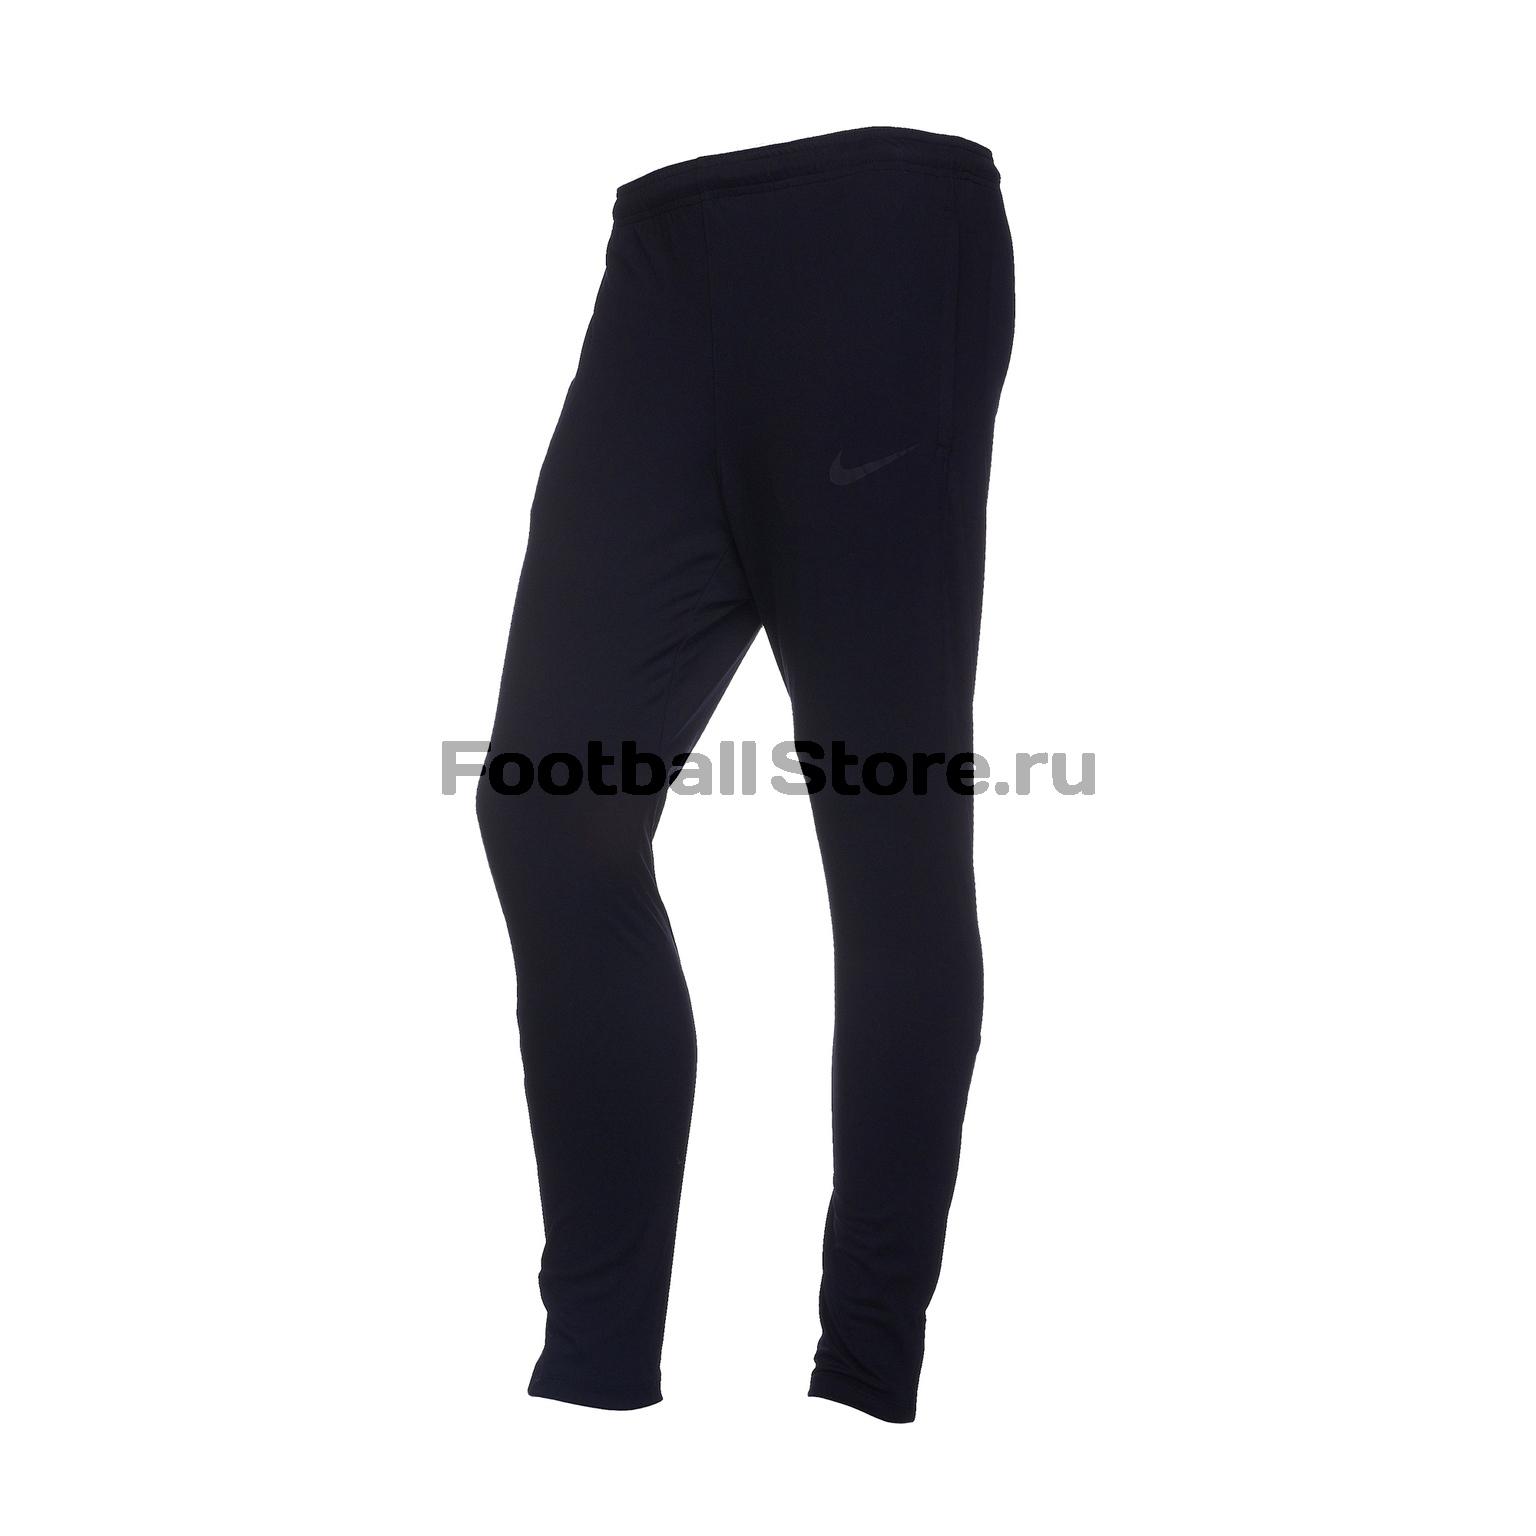 Брюки тренировочные Nike F.C. Pant KPZ AH8450-010 брюки тренировочные nike m nk dry sqd17 pant kpz 832276 010